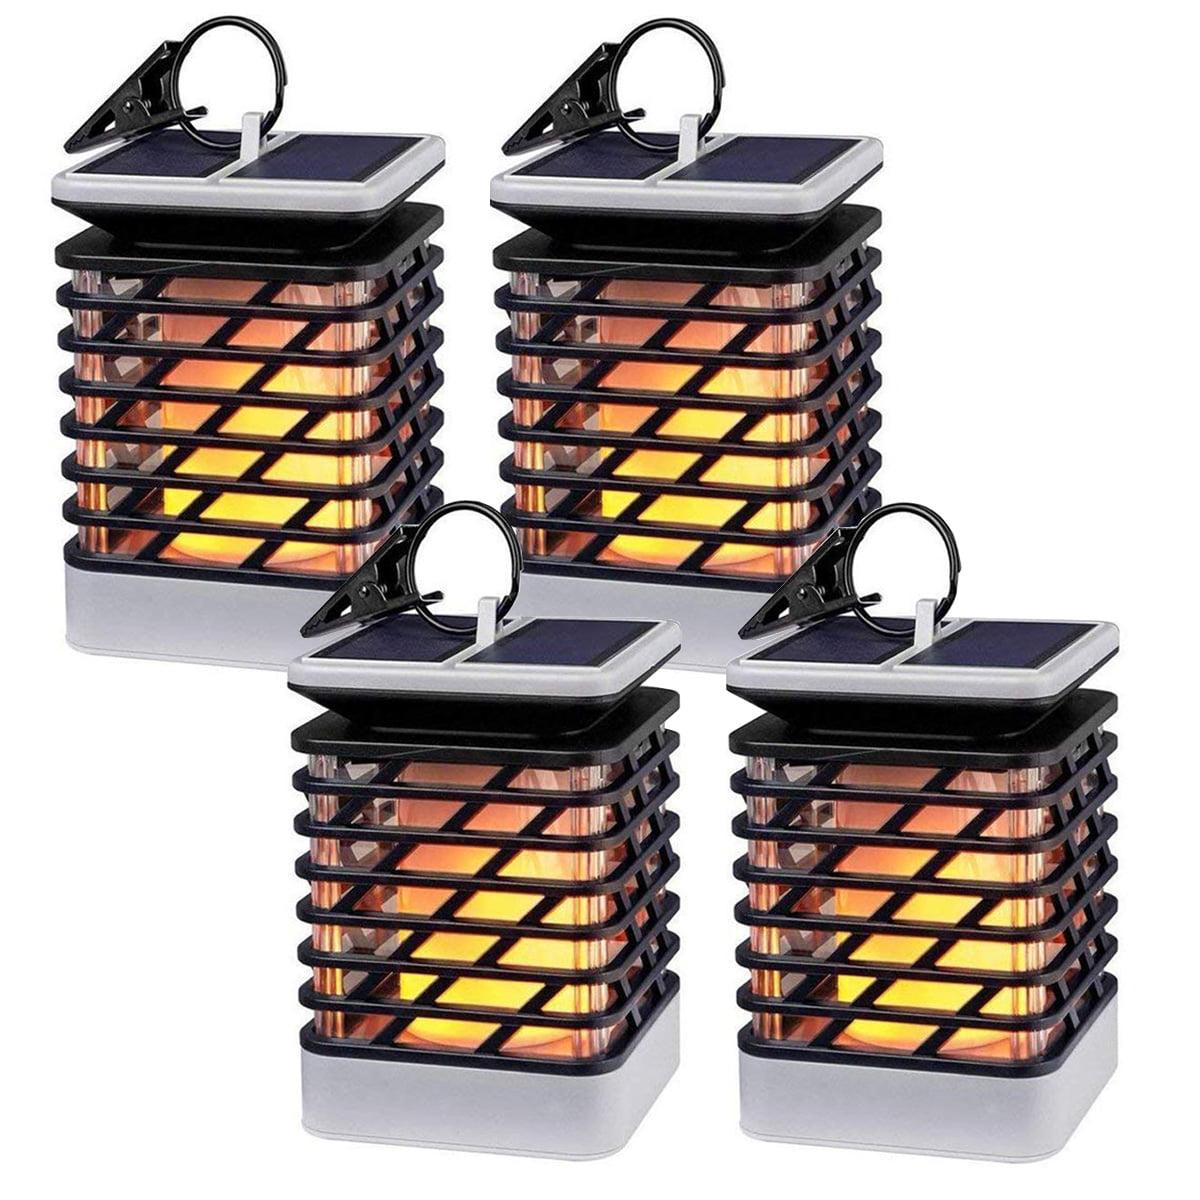 99 Lighting Amp Solar Evangelinterior